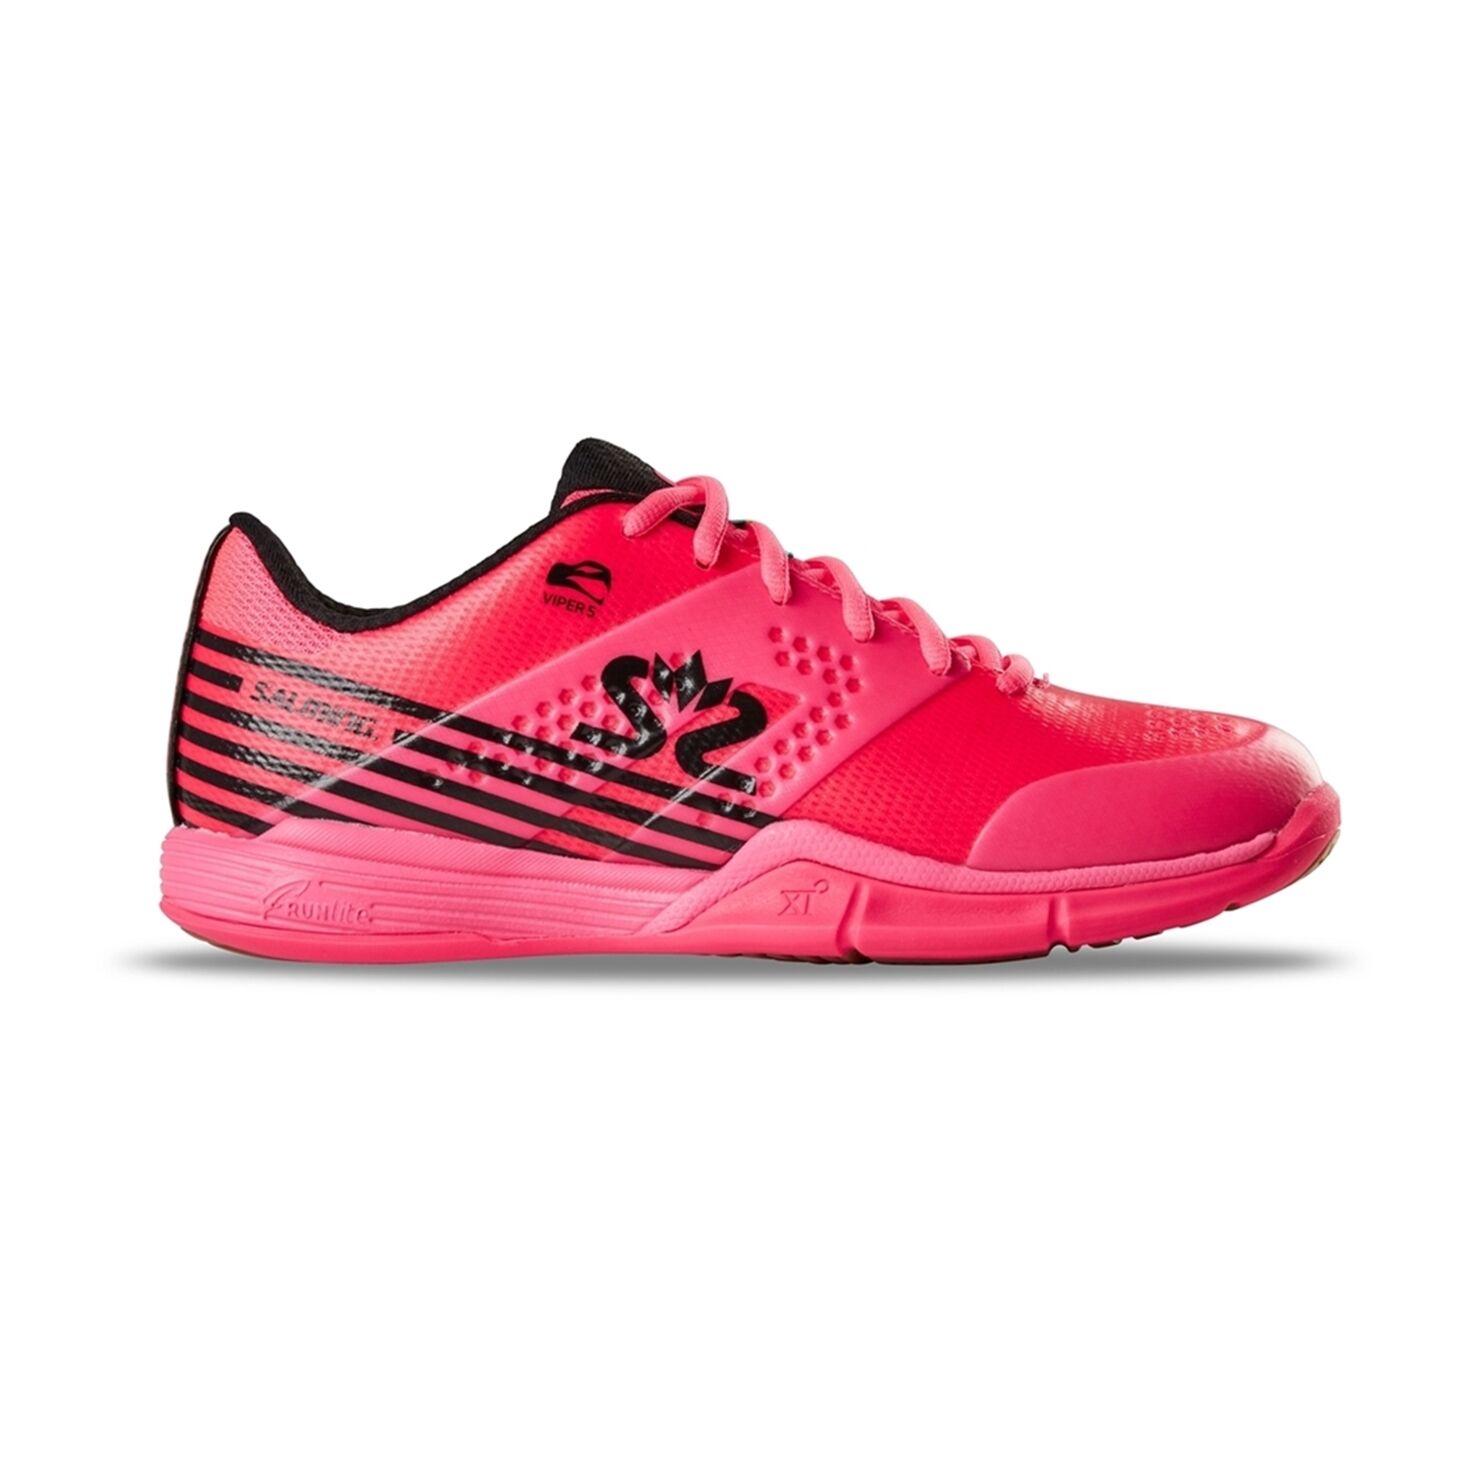 Salming Viper 5 Women Pink/Black 40